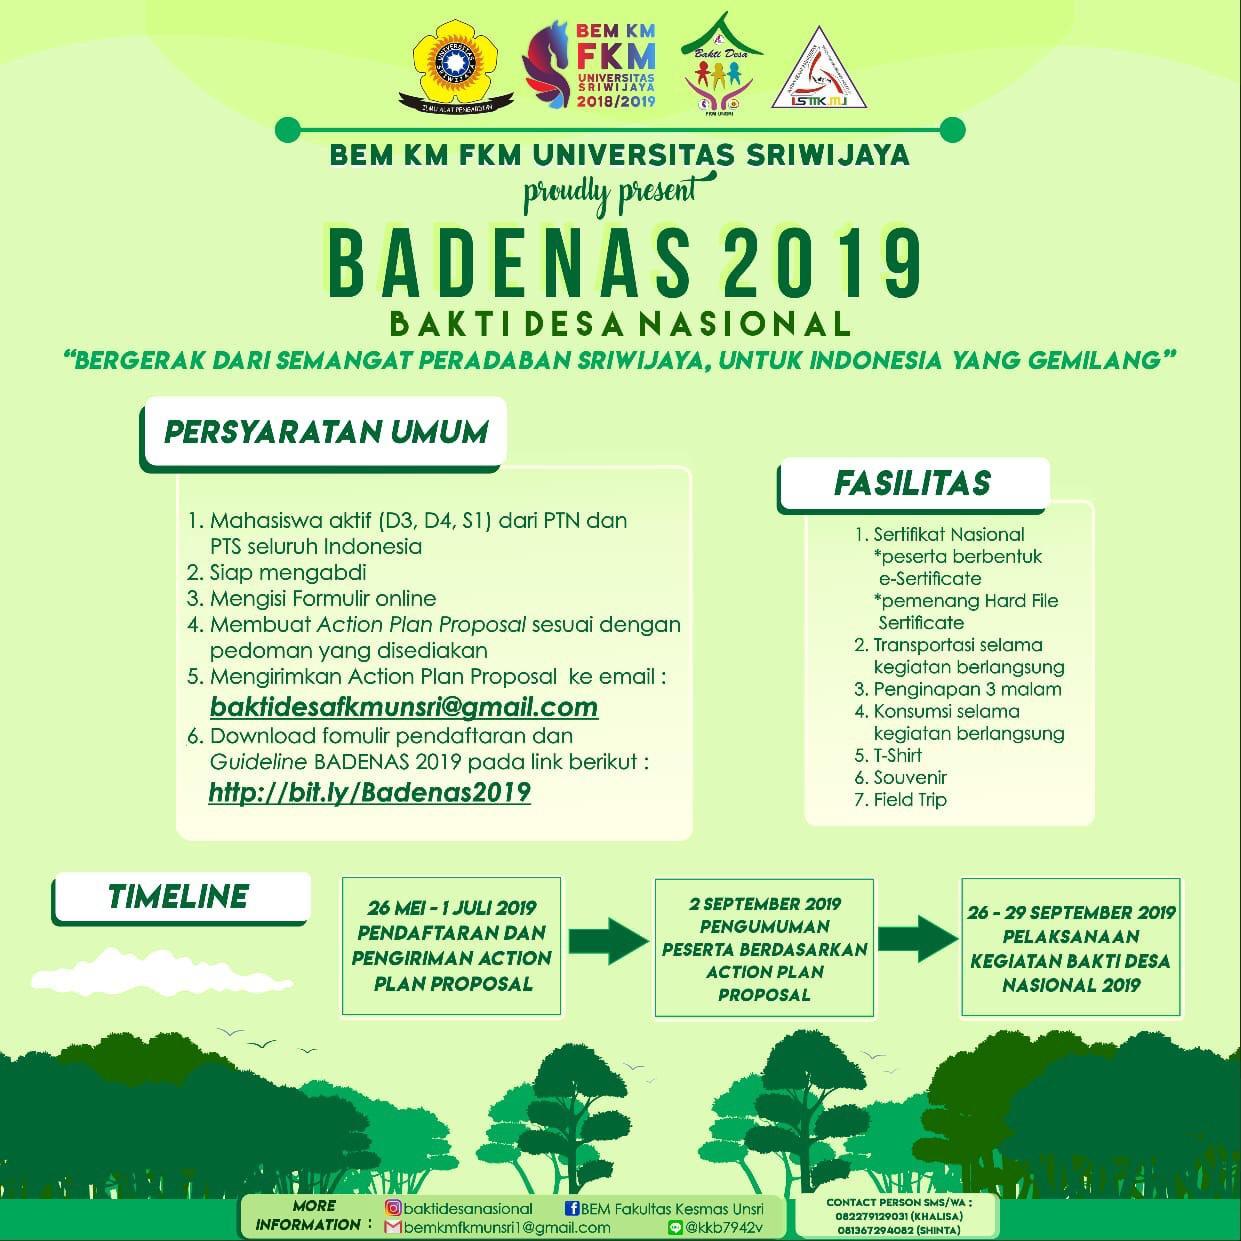 Bakti Desa Nasional 2019 FKM Univ Sriwijaya, Yuk Ikutan!